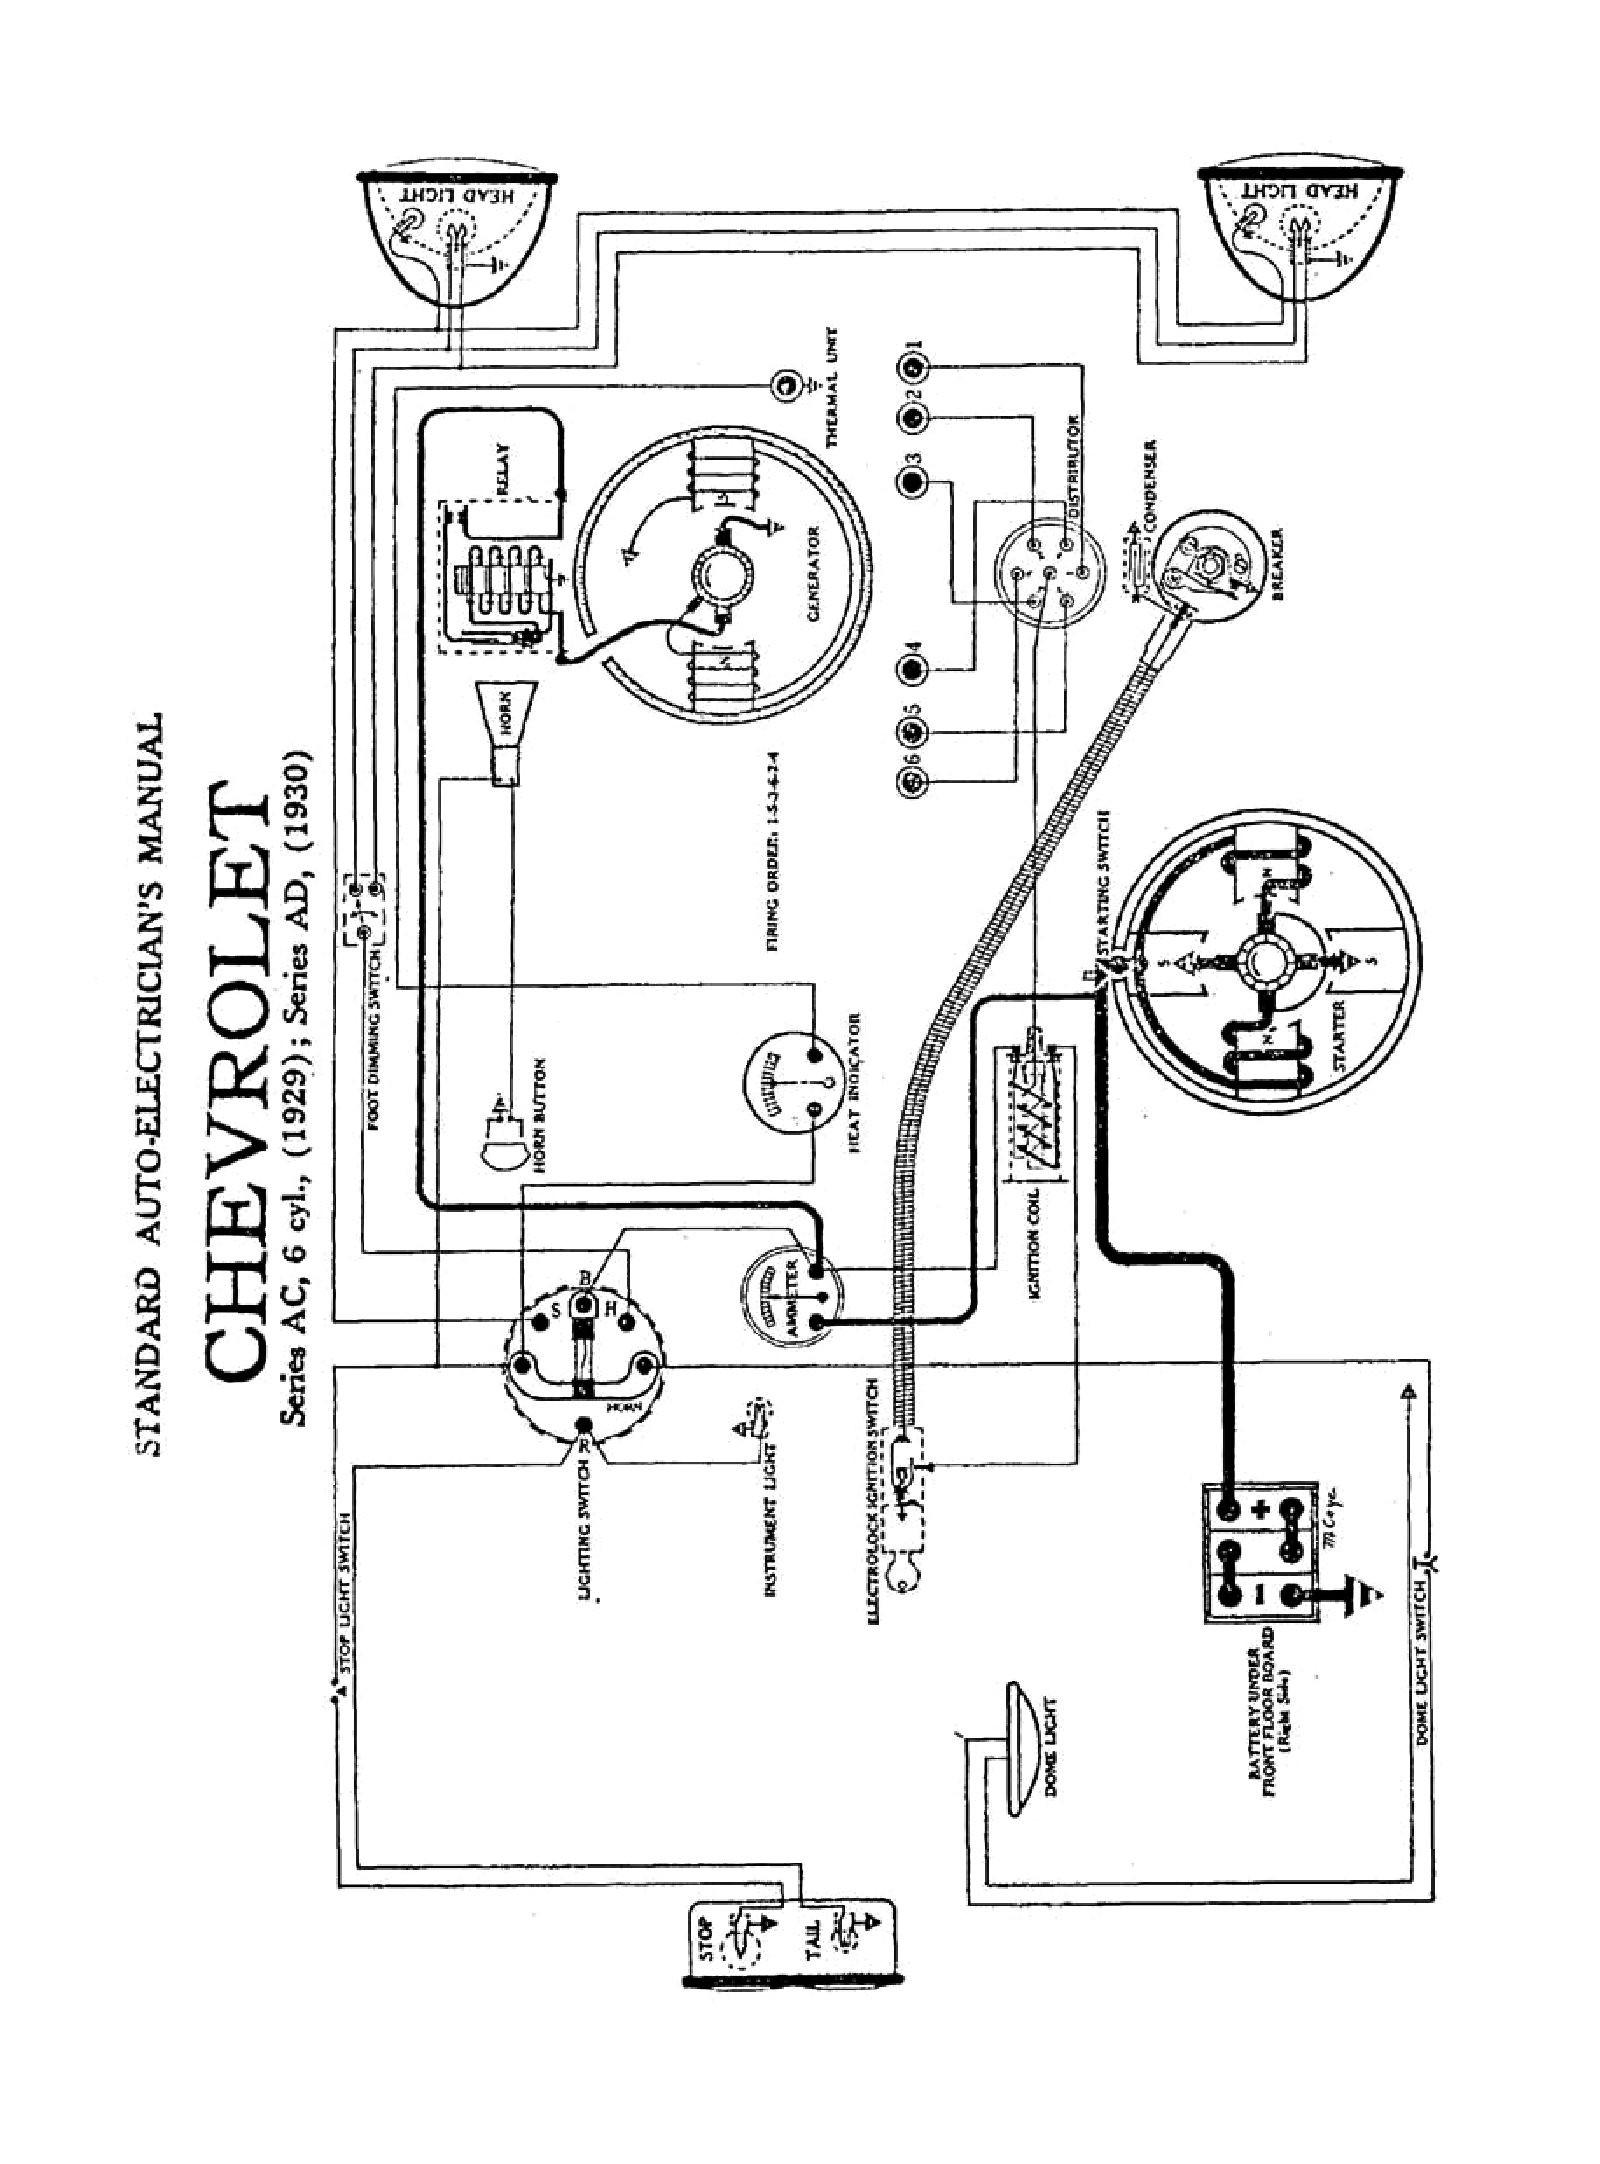 piaa 510 wiring diagram trusted wiring diagram rh dafpods co PIAA 510 Fog Light Wiring Schematic PIAA 510 Fog Light Wiring Schematic